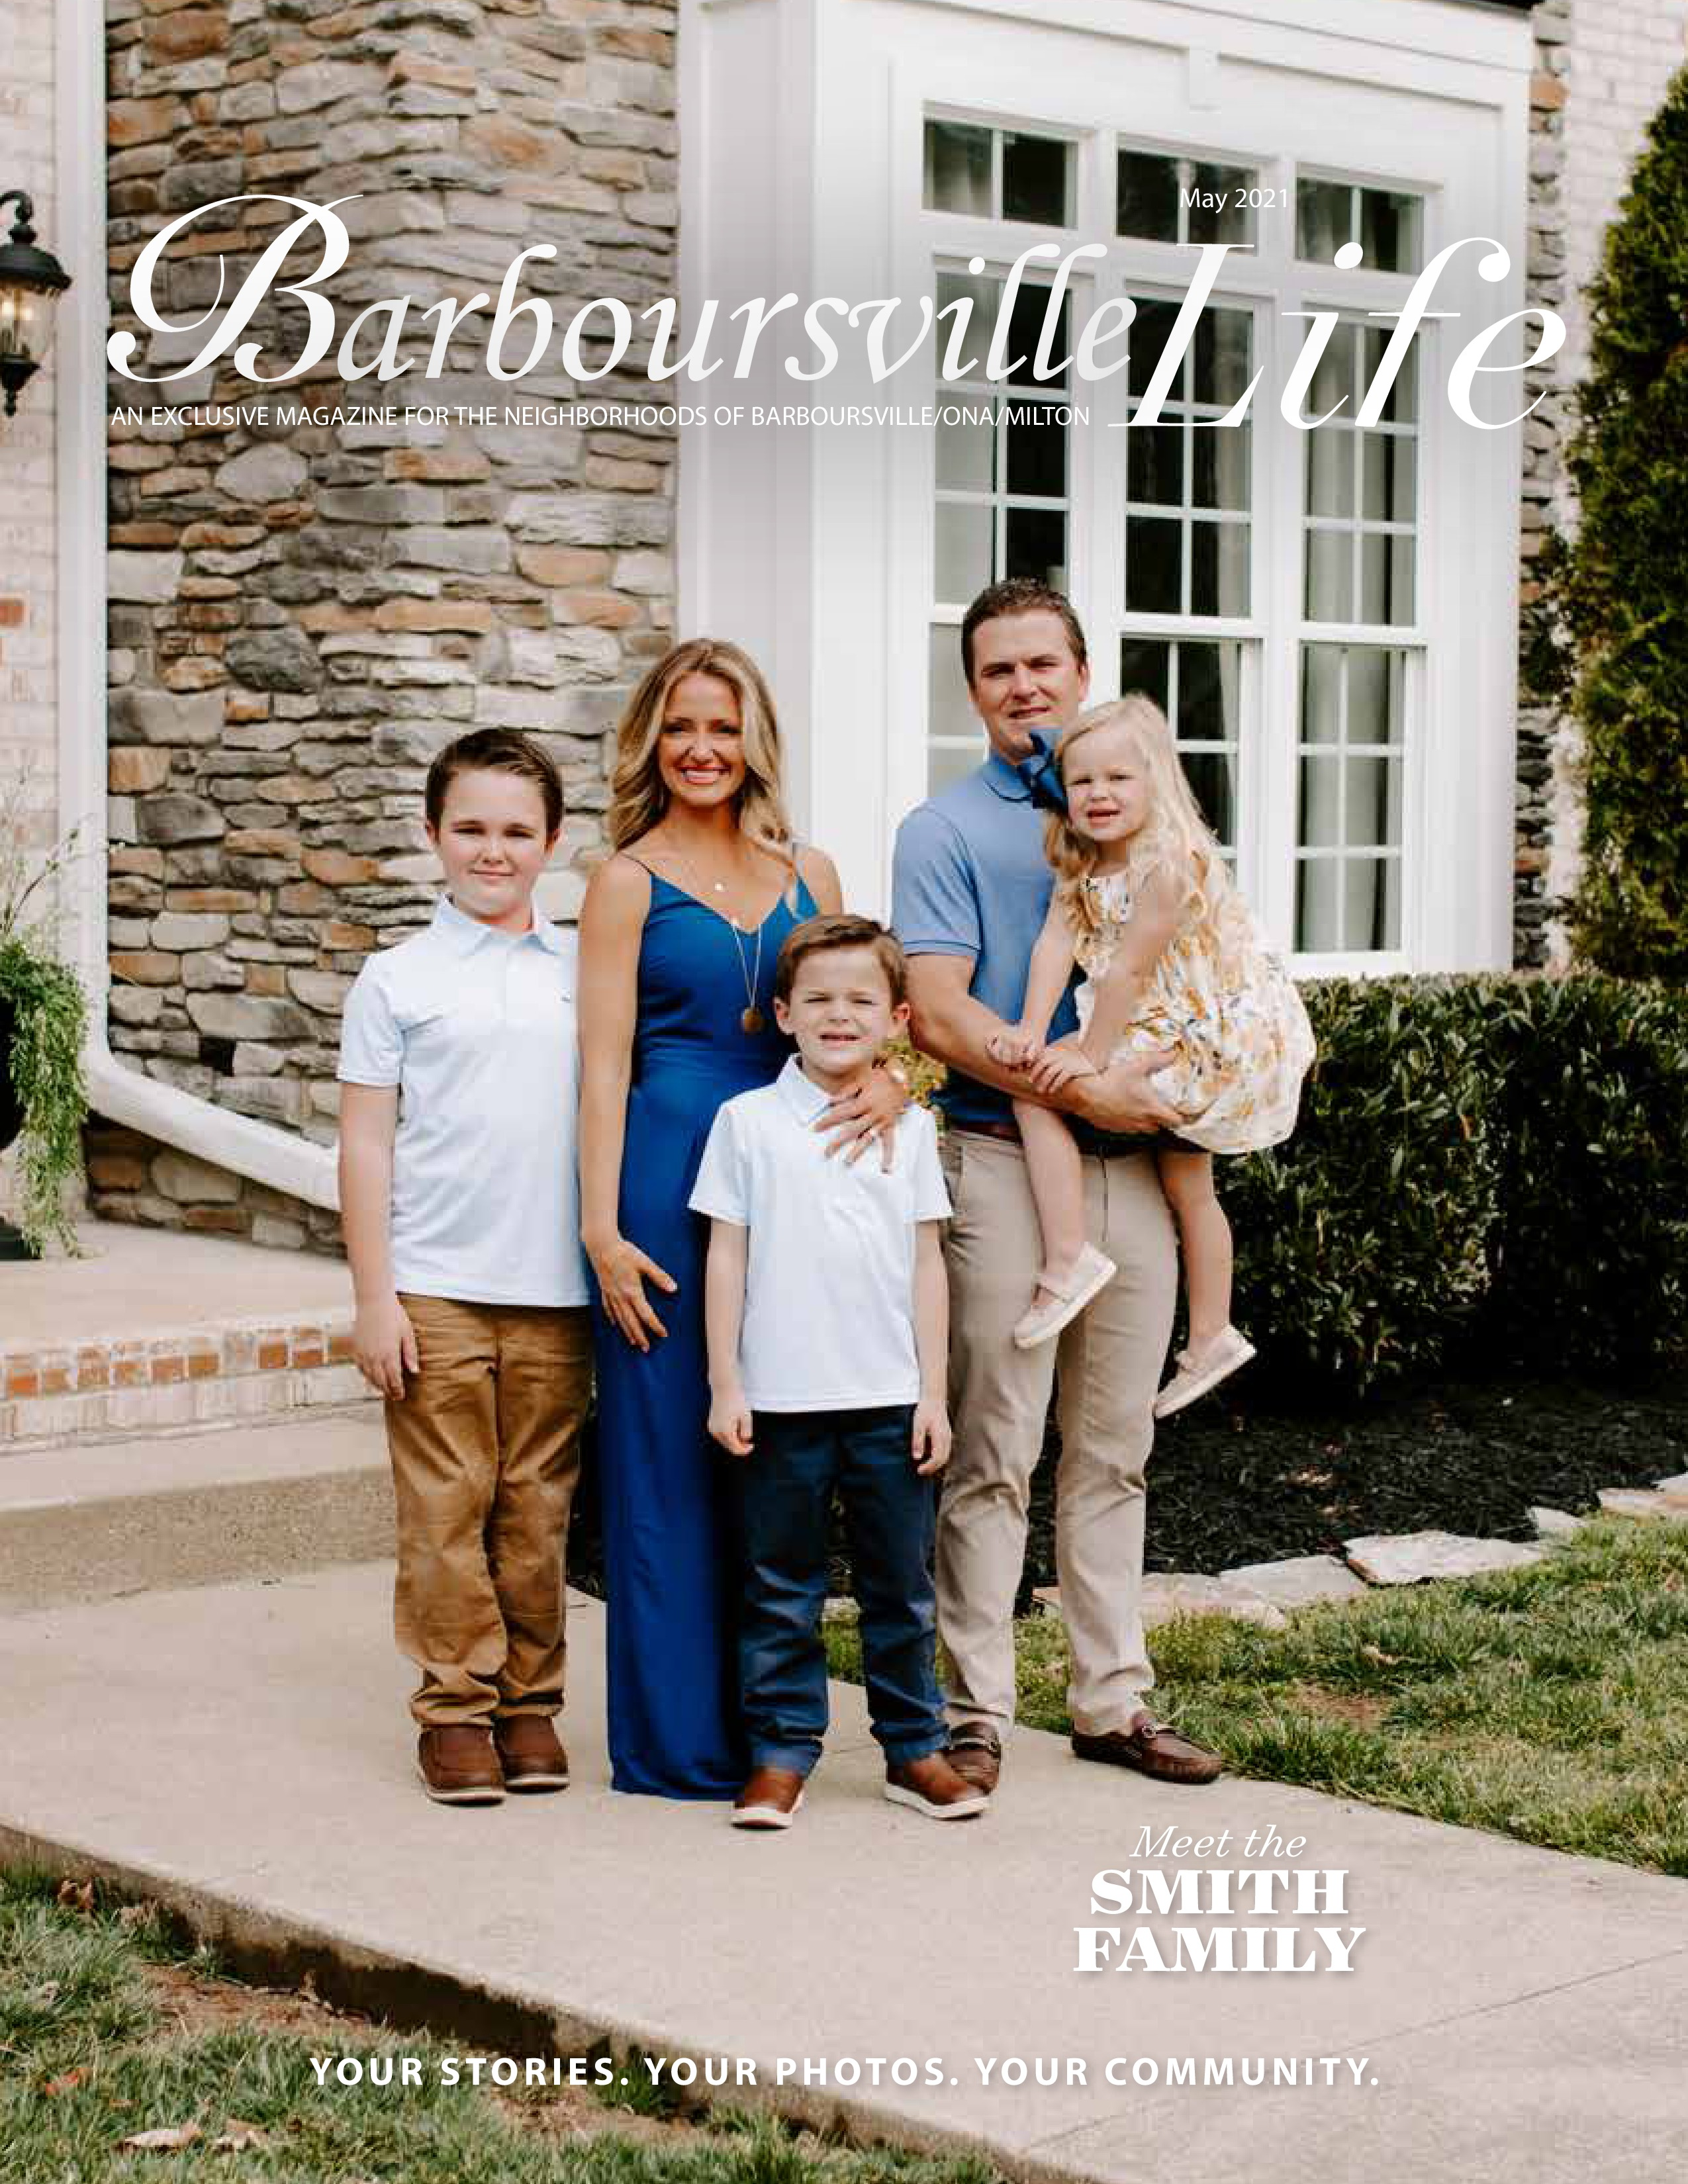 Barboursville Life 2021-05-01